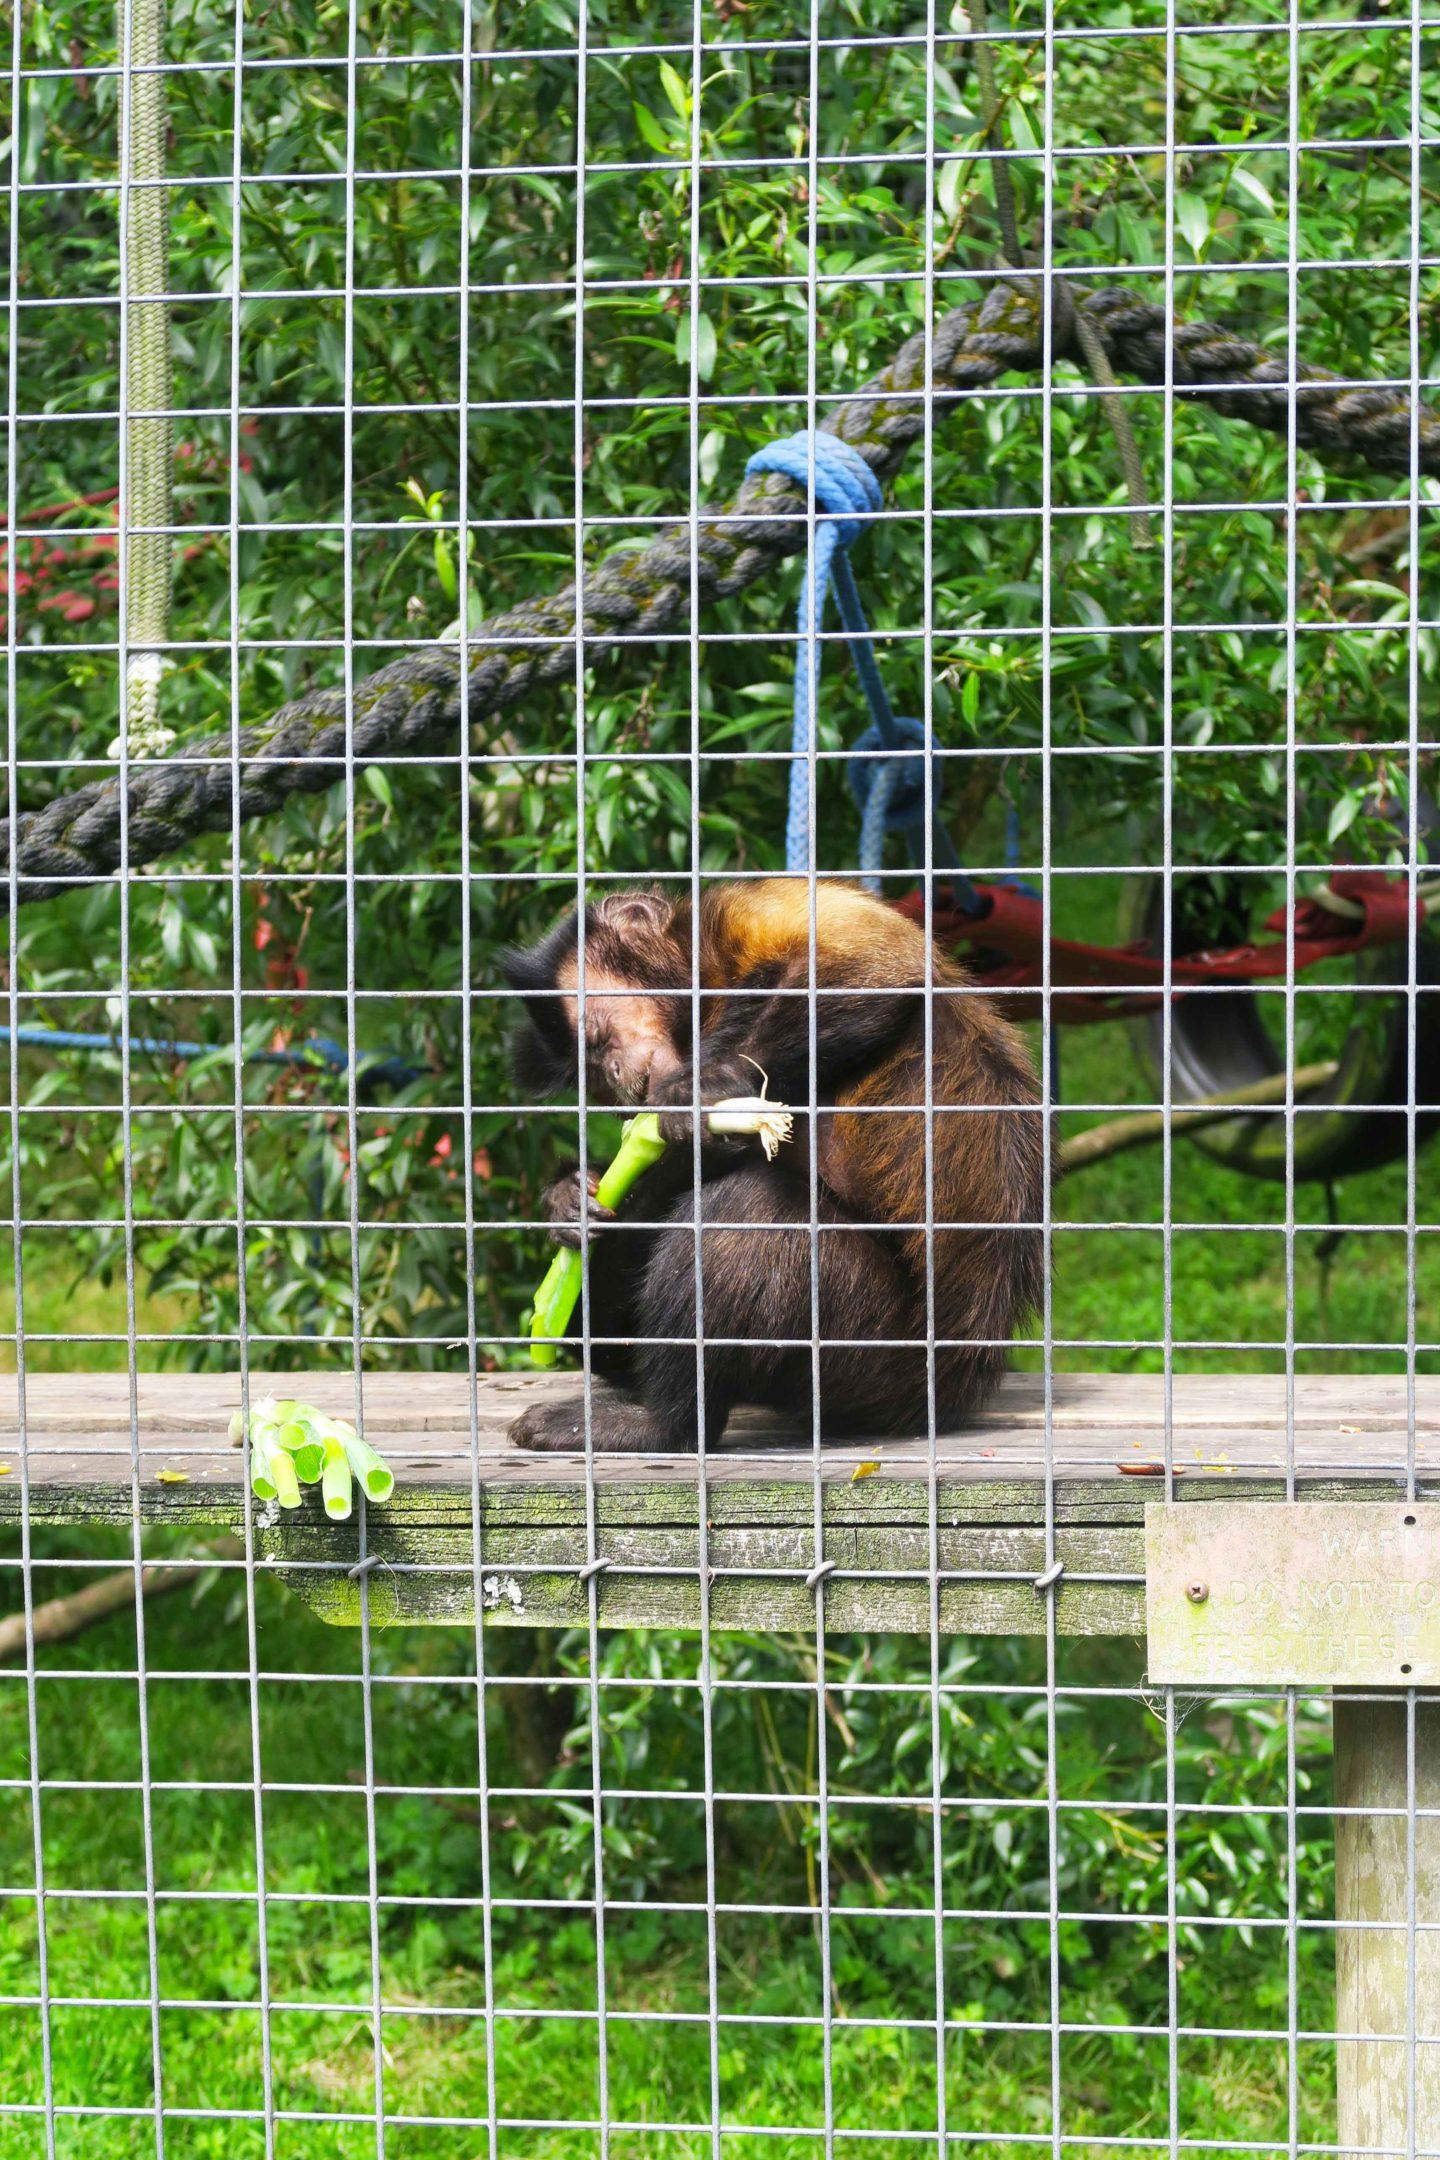 capuchin with leek in looe monkey sanctuary in cornwall